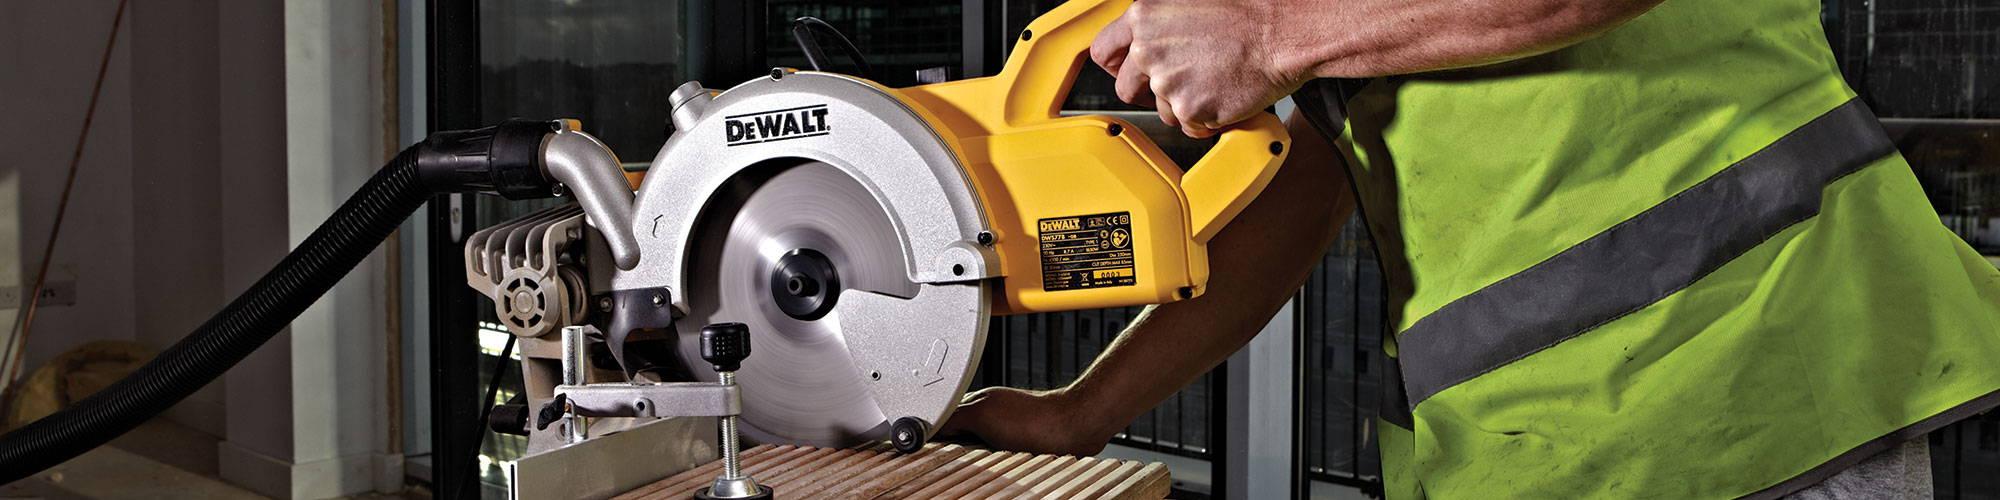 Dewalt DWS778 Mitre Saw - Everything you need to know